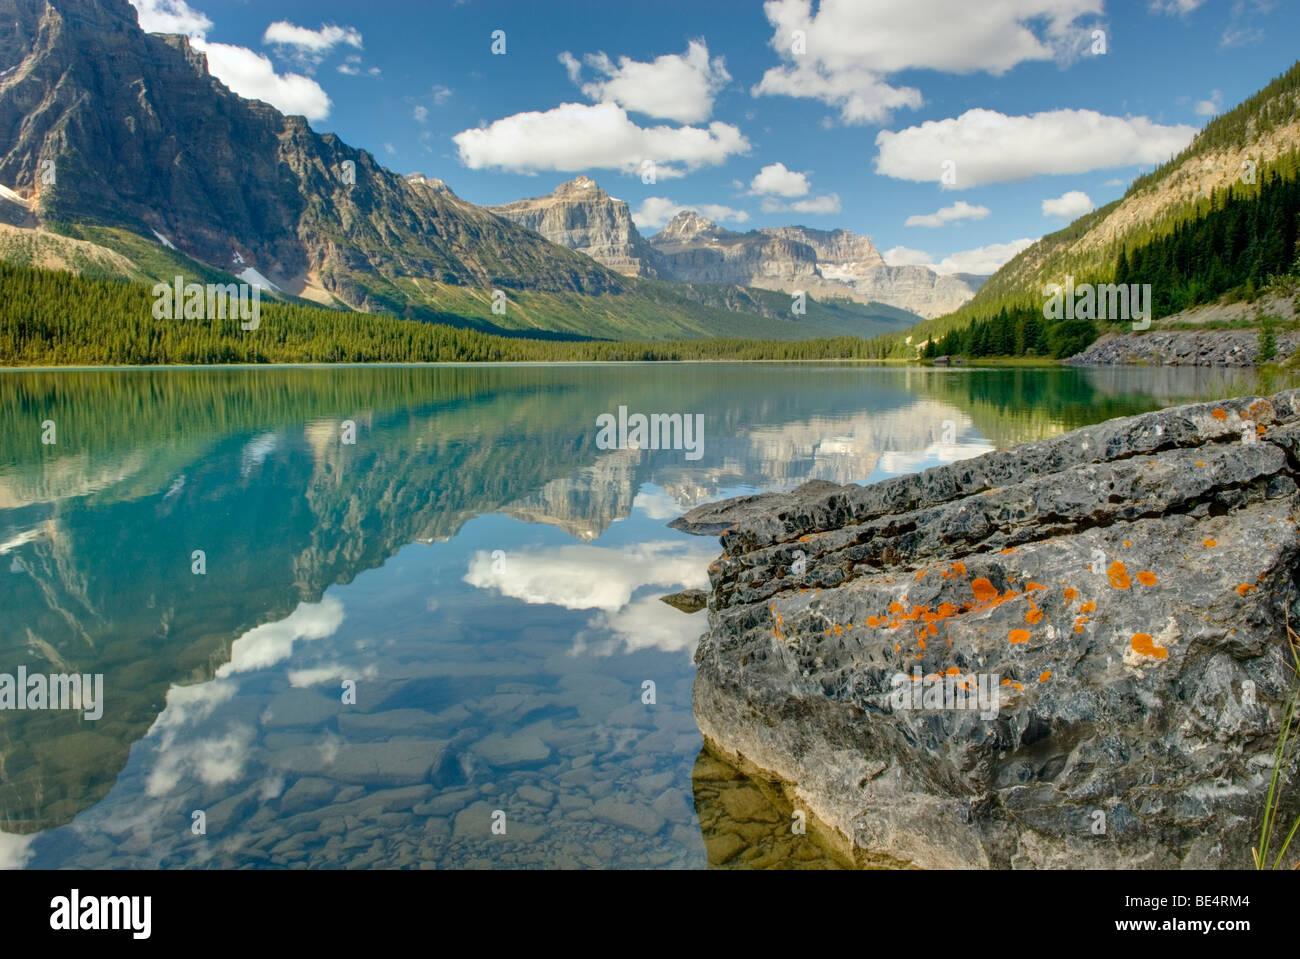 Waterfowl Lake, Banff National Park Alberta Canada - Stock Image